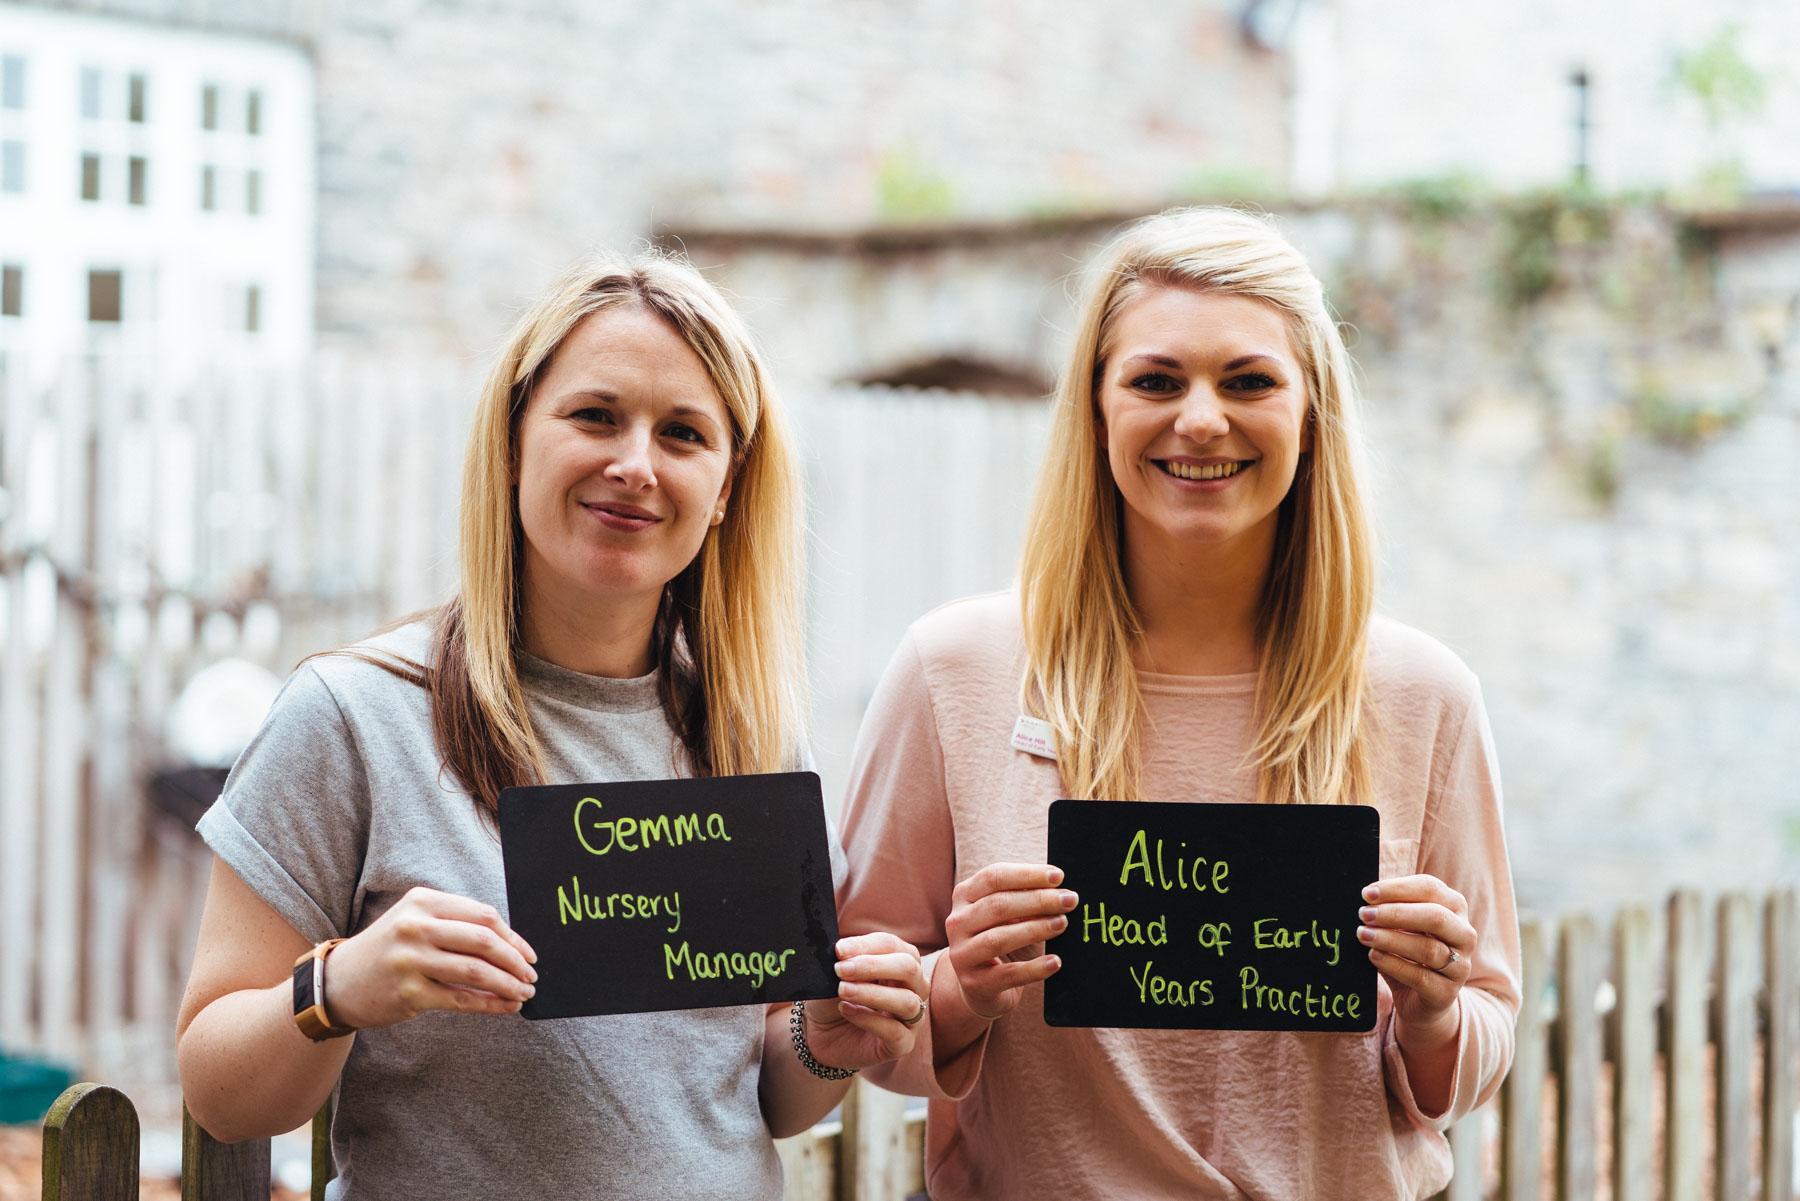 Gemma Smith & Alice Hill, the Management Team